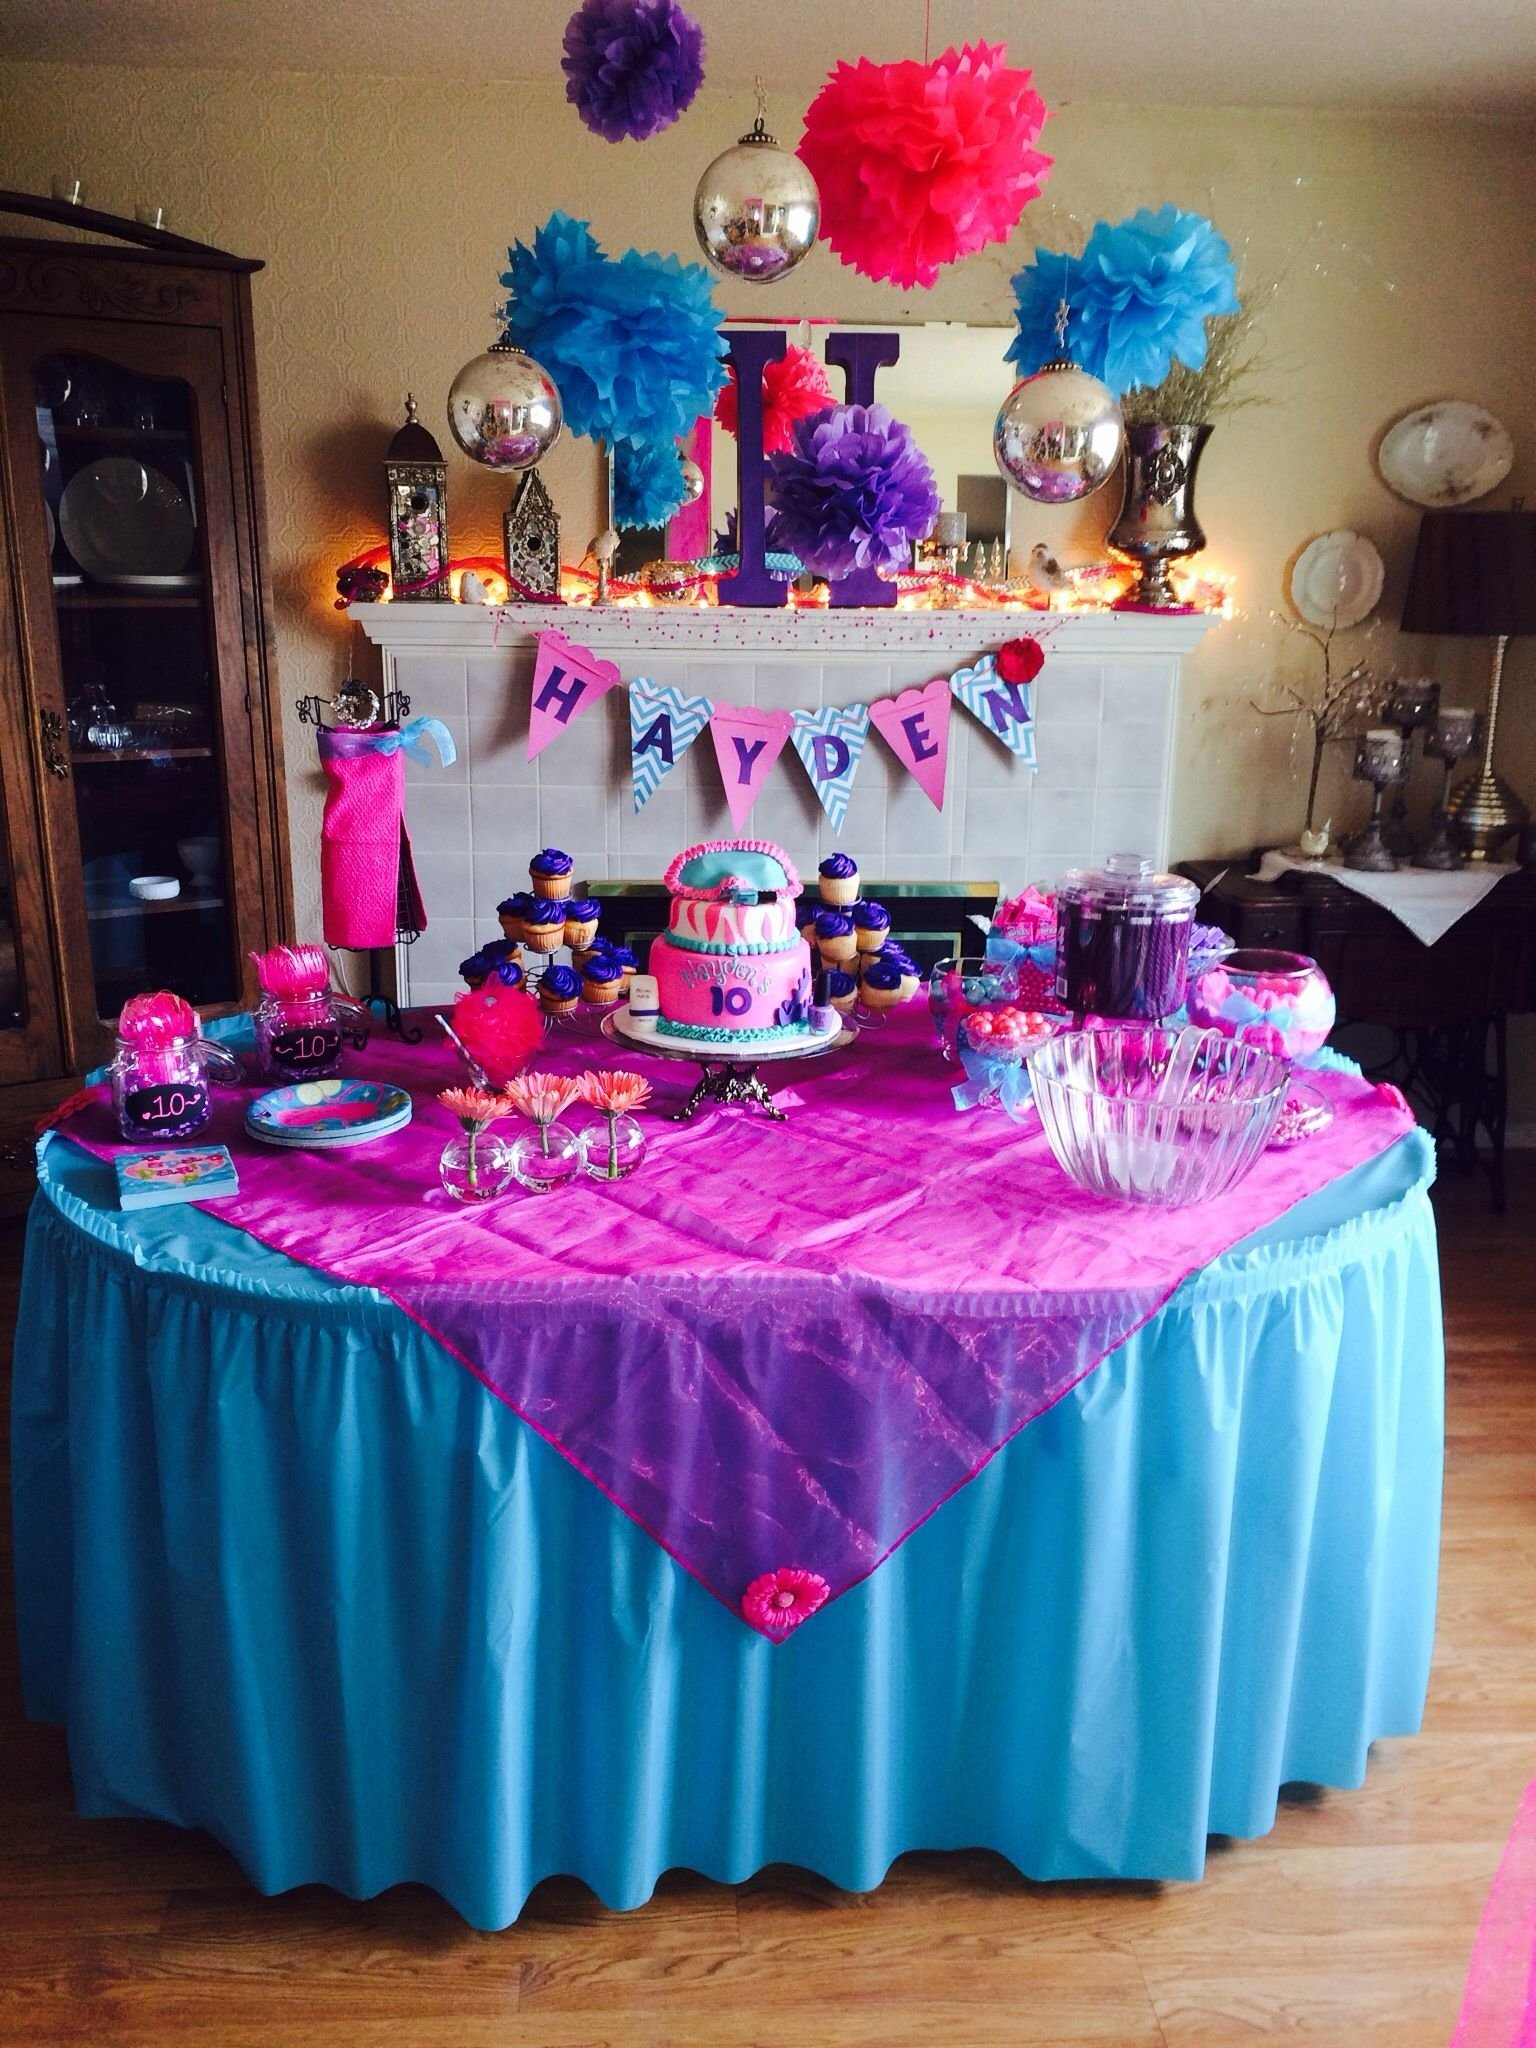 10 Most Popular 7 Yr Old Girl Birthday Party Ideas photos 10 yr old girl birthday party ideas homemade party decor